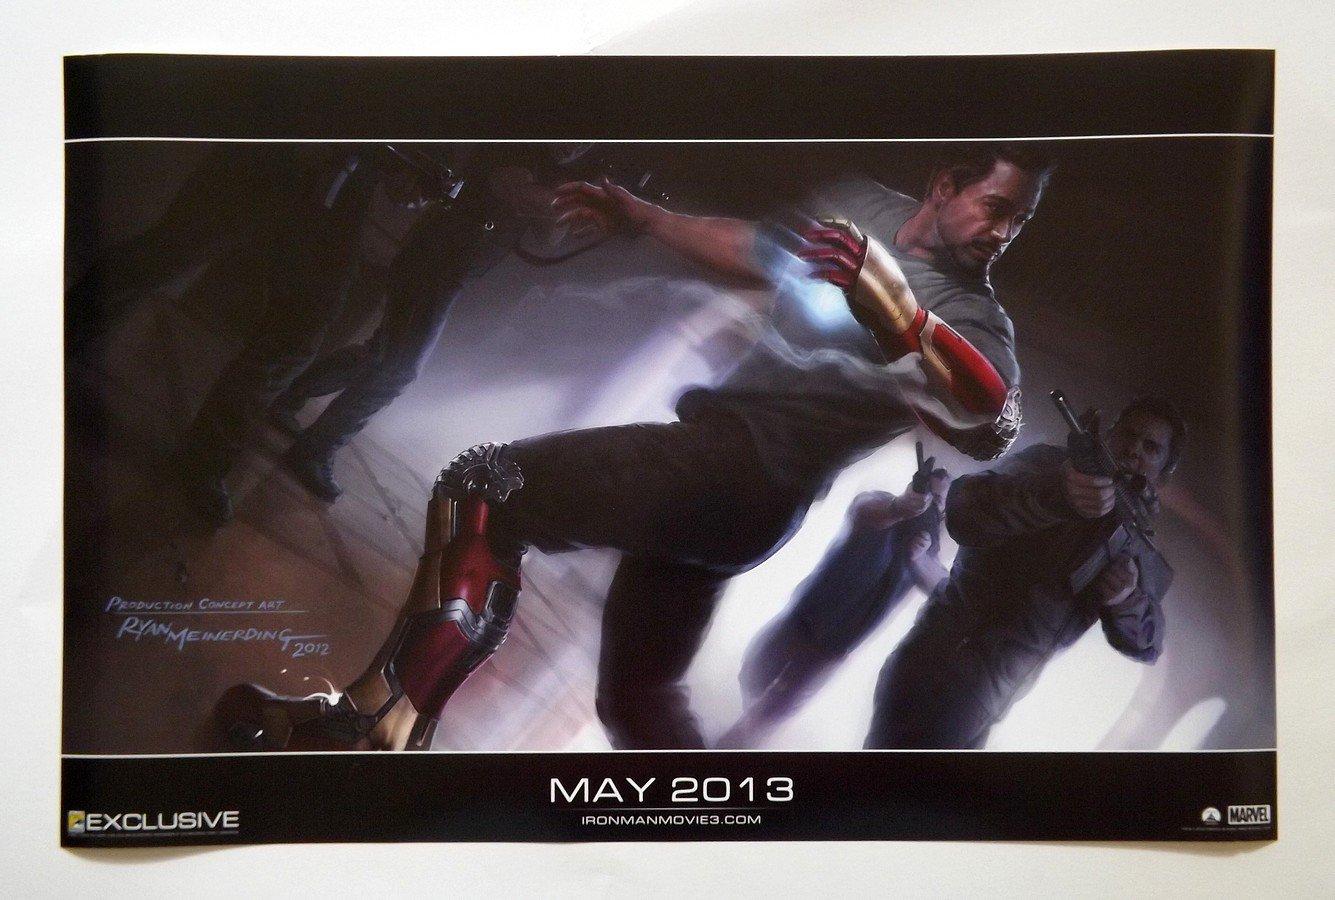 IRON MAN 3 Promo Poster Concept Art - Marvel - SDCC Comic Con 2012